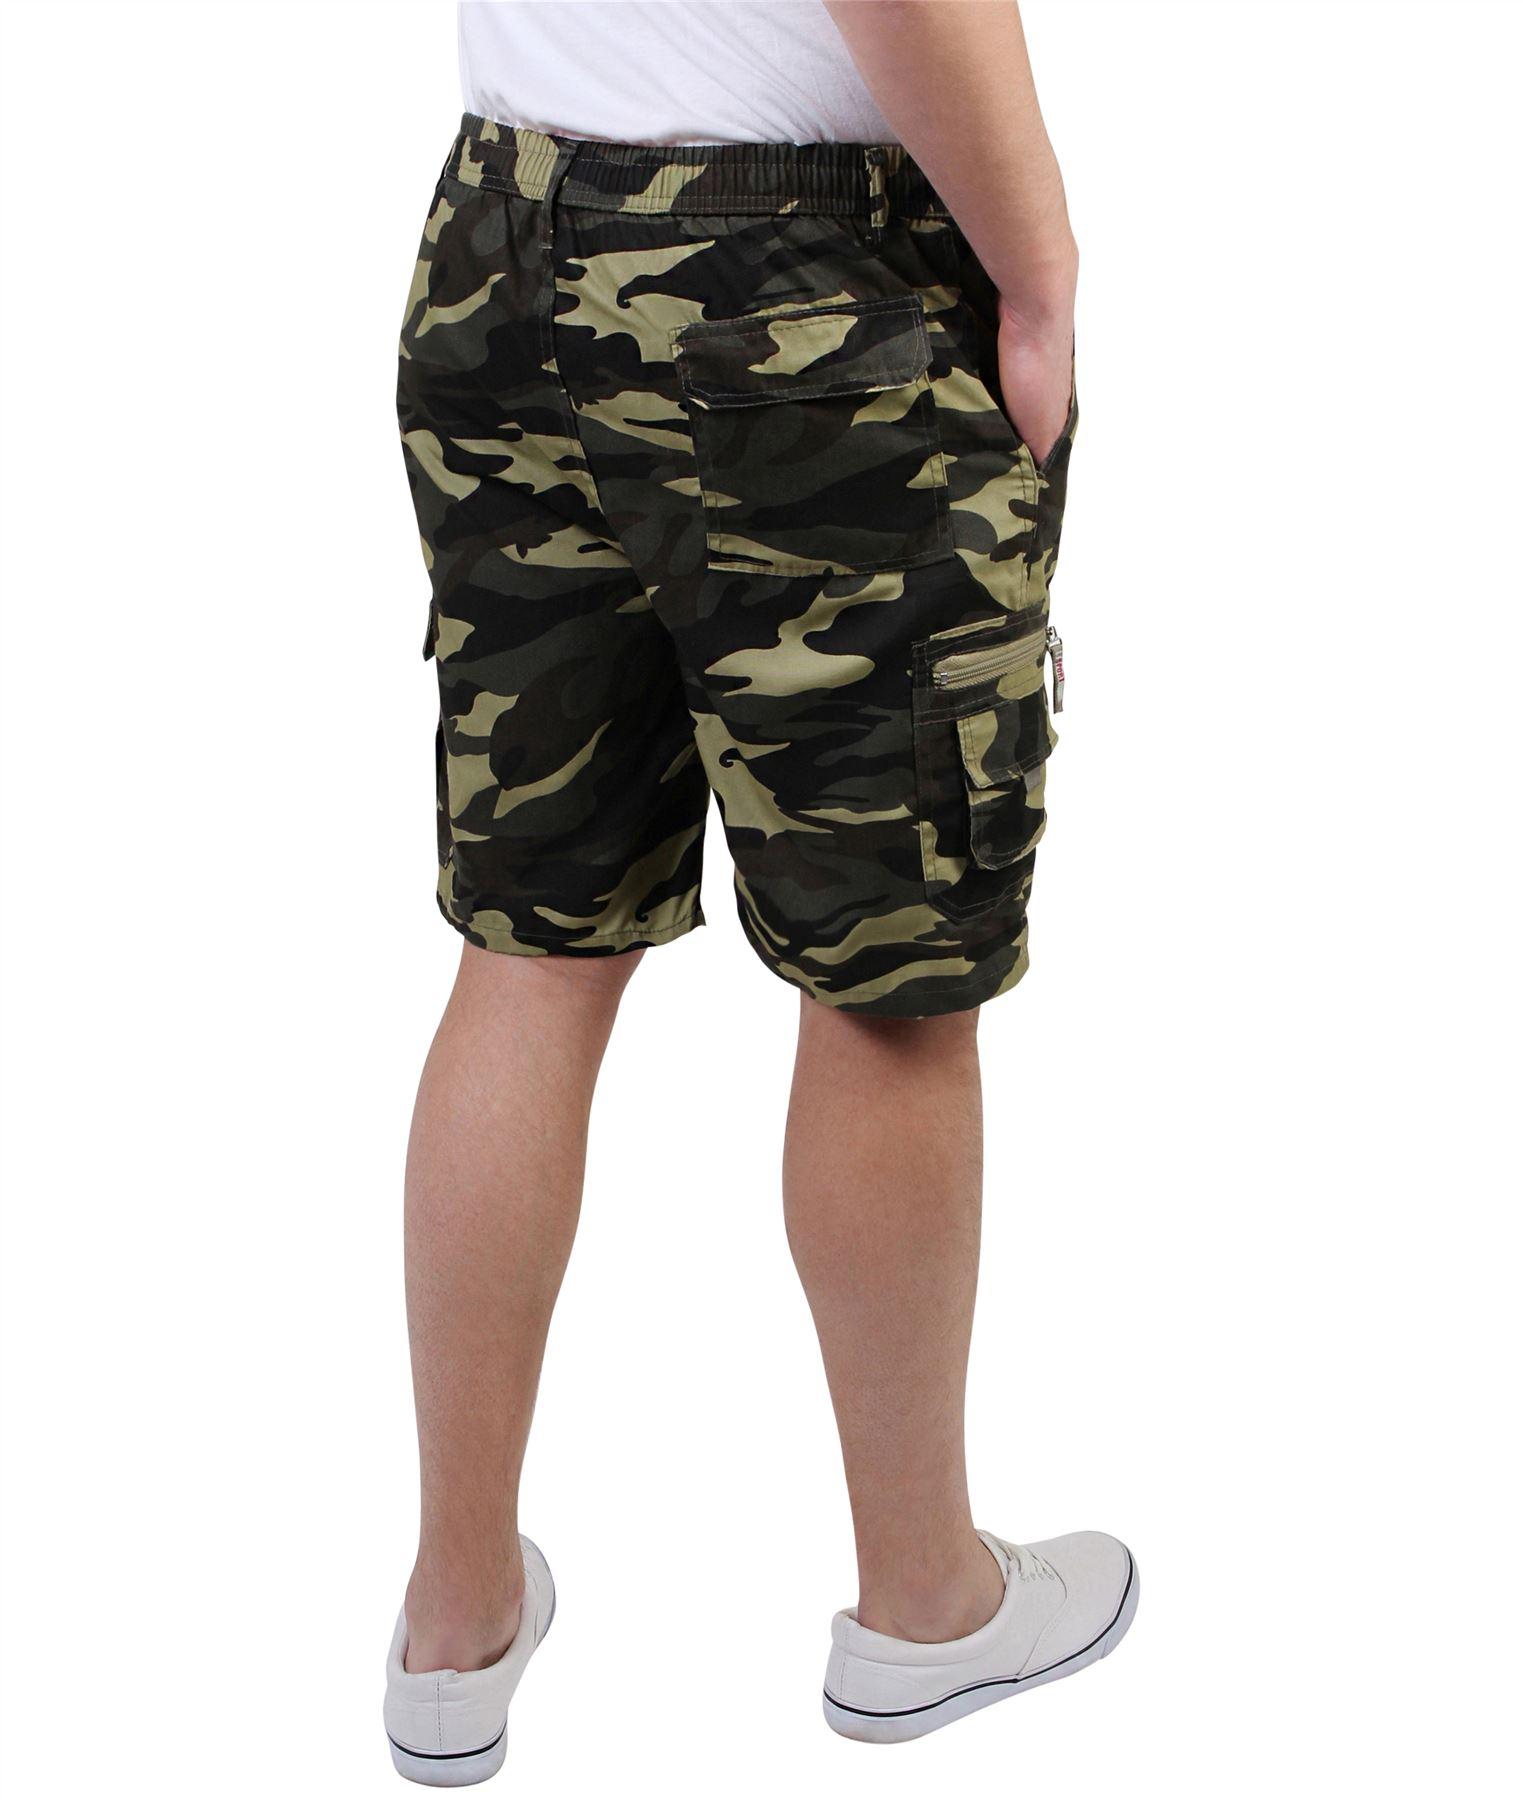 Men Camo Cargo Shorts Summer Army Camouflage Combat Camo Cargo Pocket Short PanT